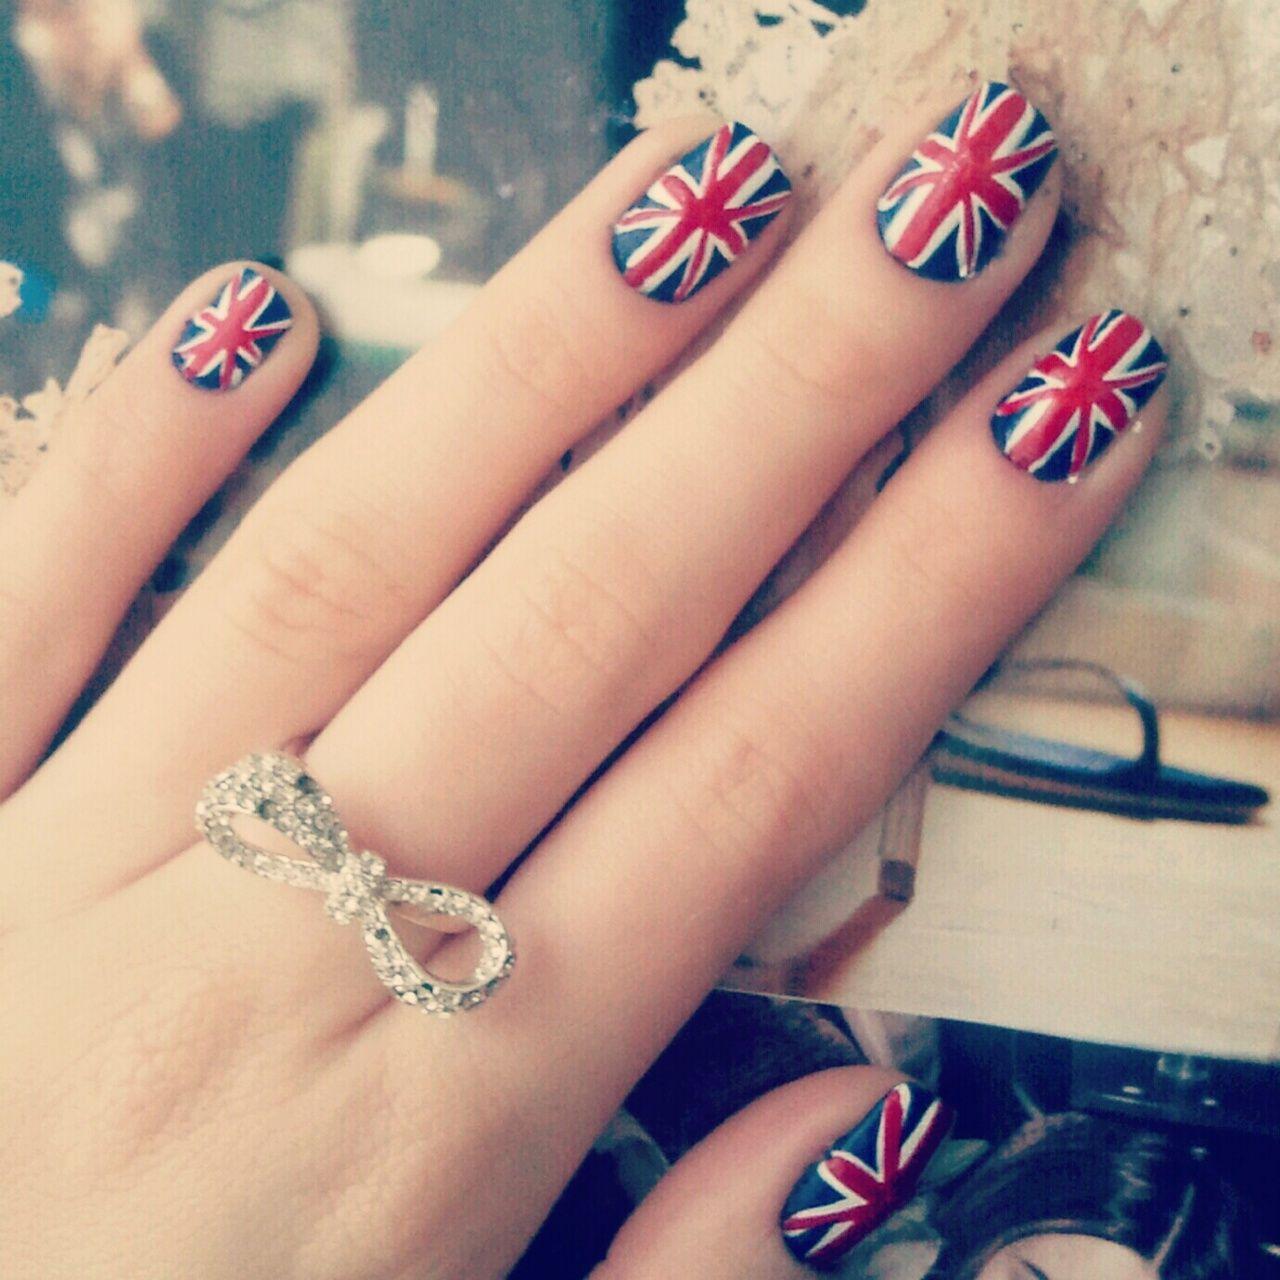 Union Jack nails, in attesa delle Olimpiadi | UK MANIA! | Pinterest ...